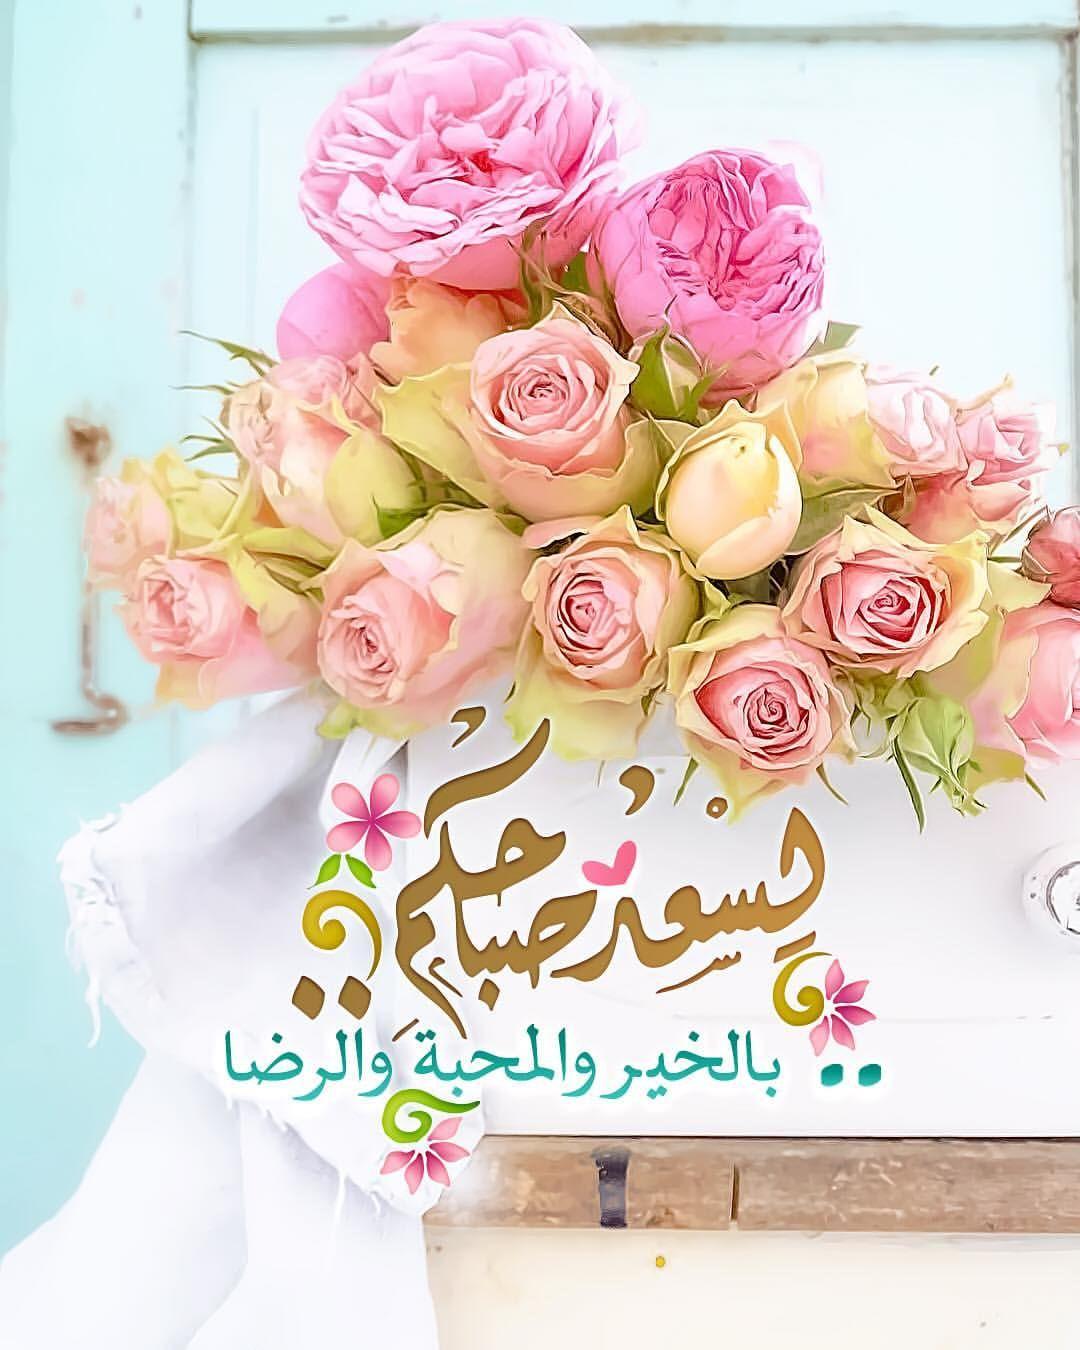 Pearla0203 On Instagram يسعد صباحكم بالخيــــــر والم Beautiful Morning Messages Good Morning Beautiful Flowers Good Morning Images Flowers